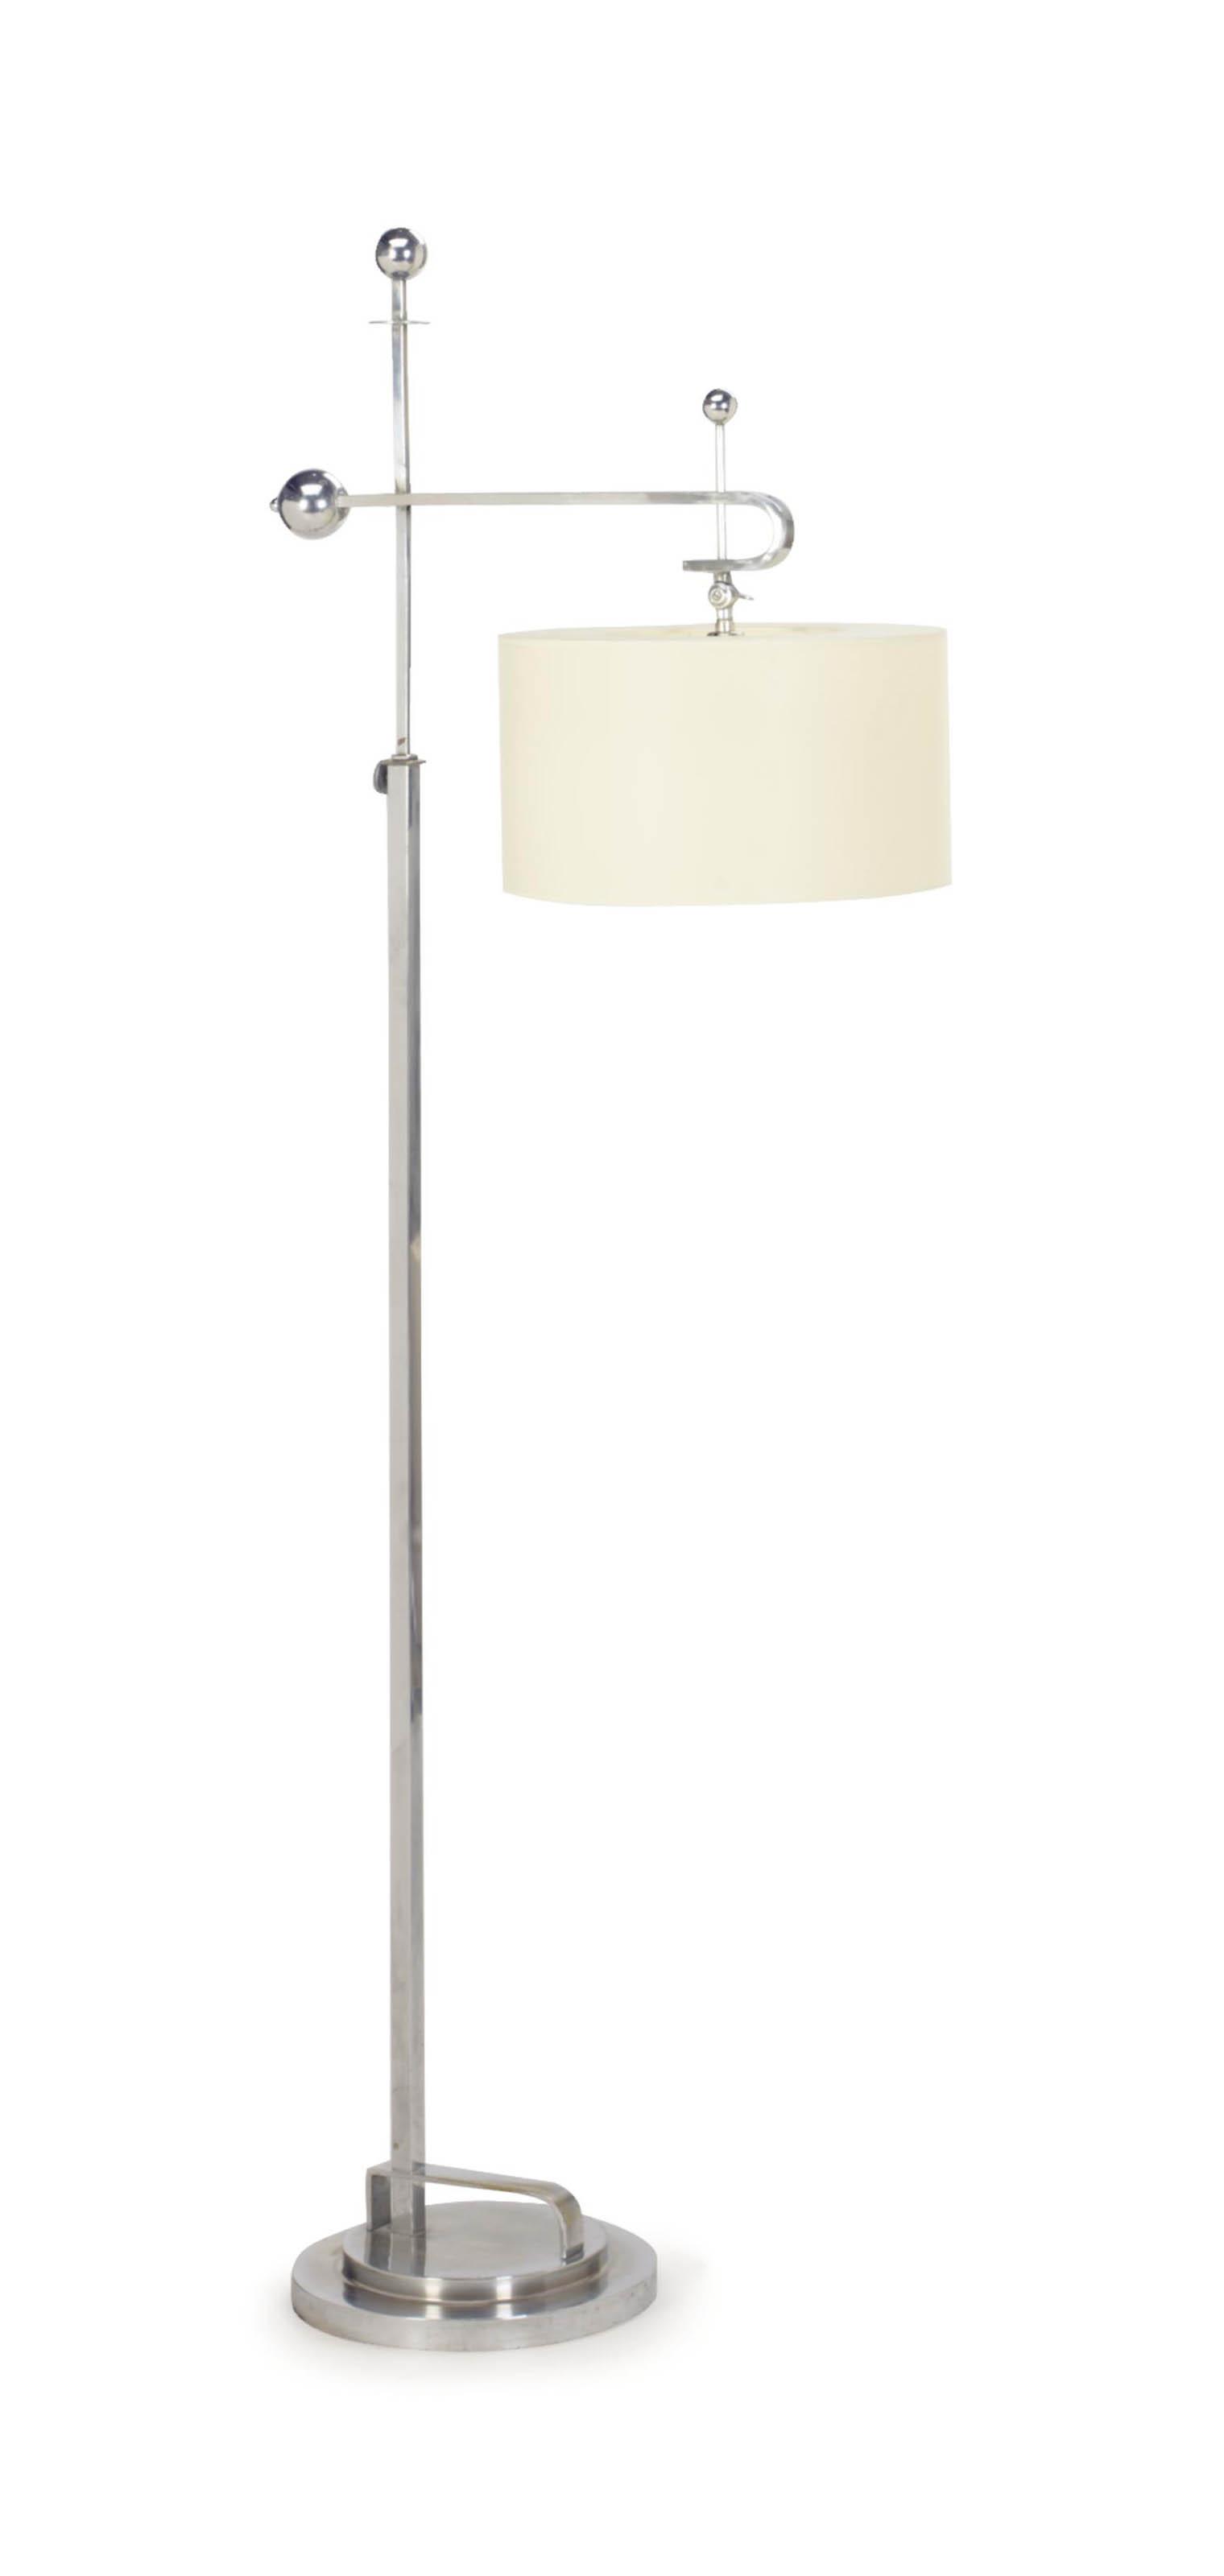 A CHROMED-METAL ADJUSTABLE FLOOR LAMP,